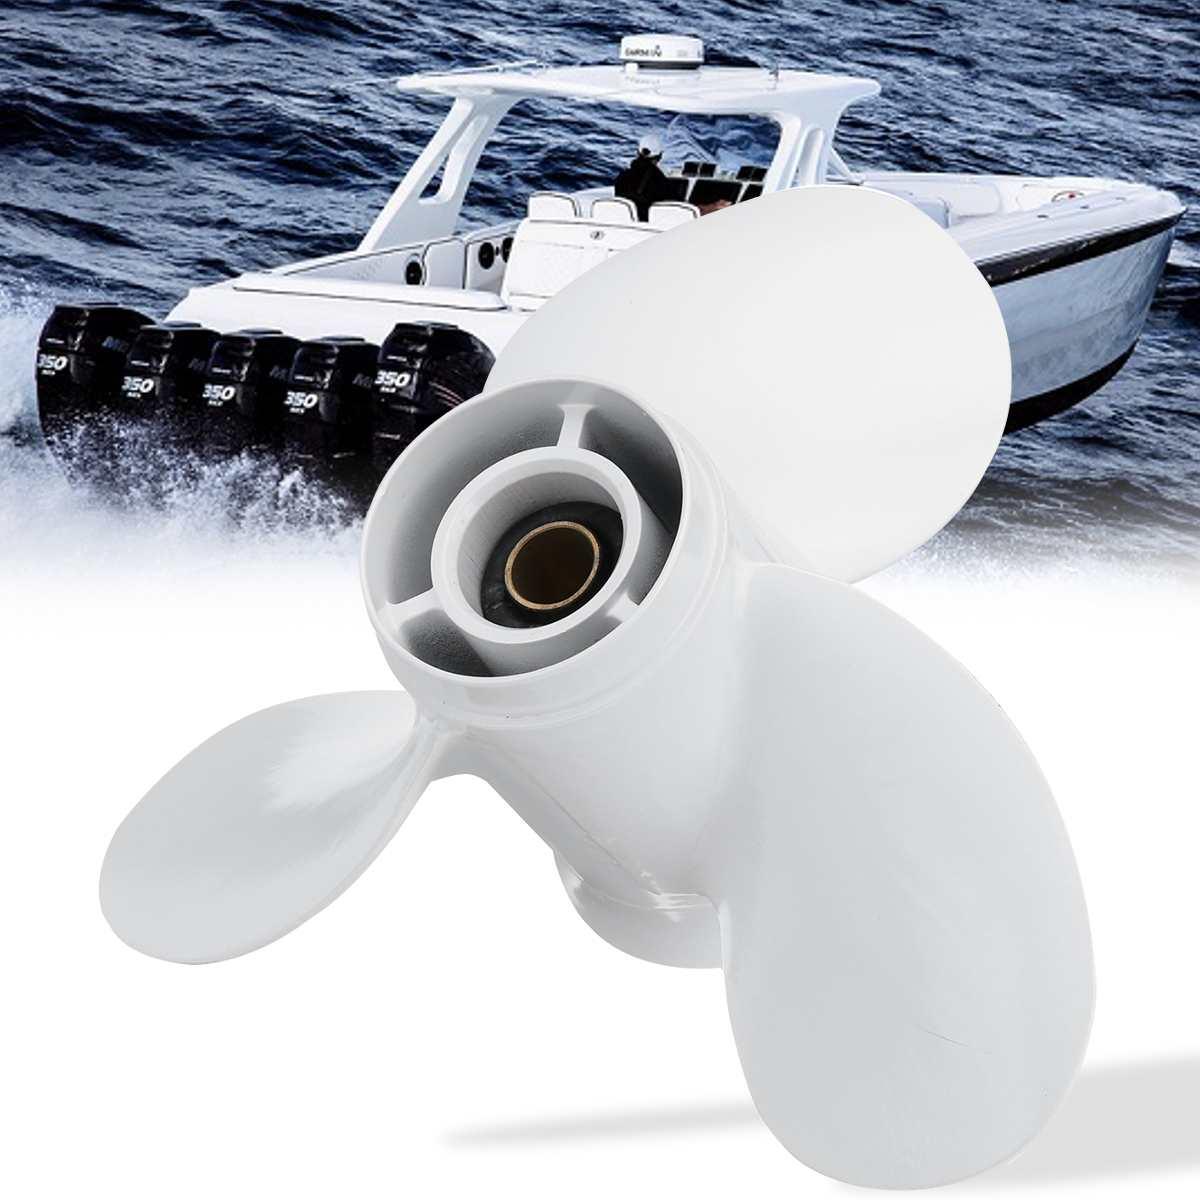 683 45941 00 EL Aluminum 9 1 4 x 12 Boat Outboard Propeller For Yamaha 9